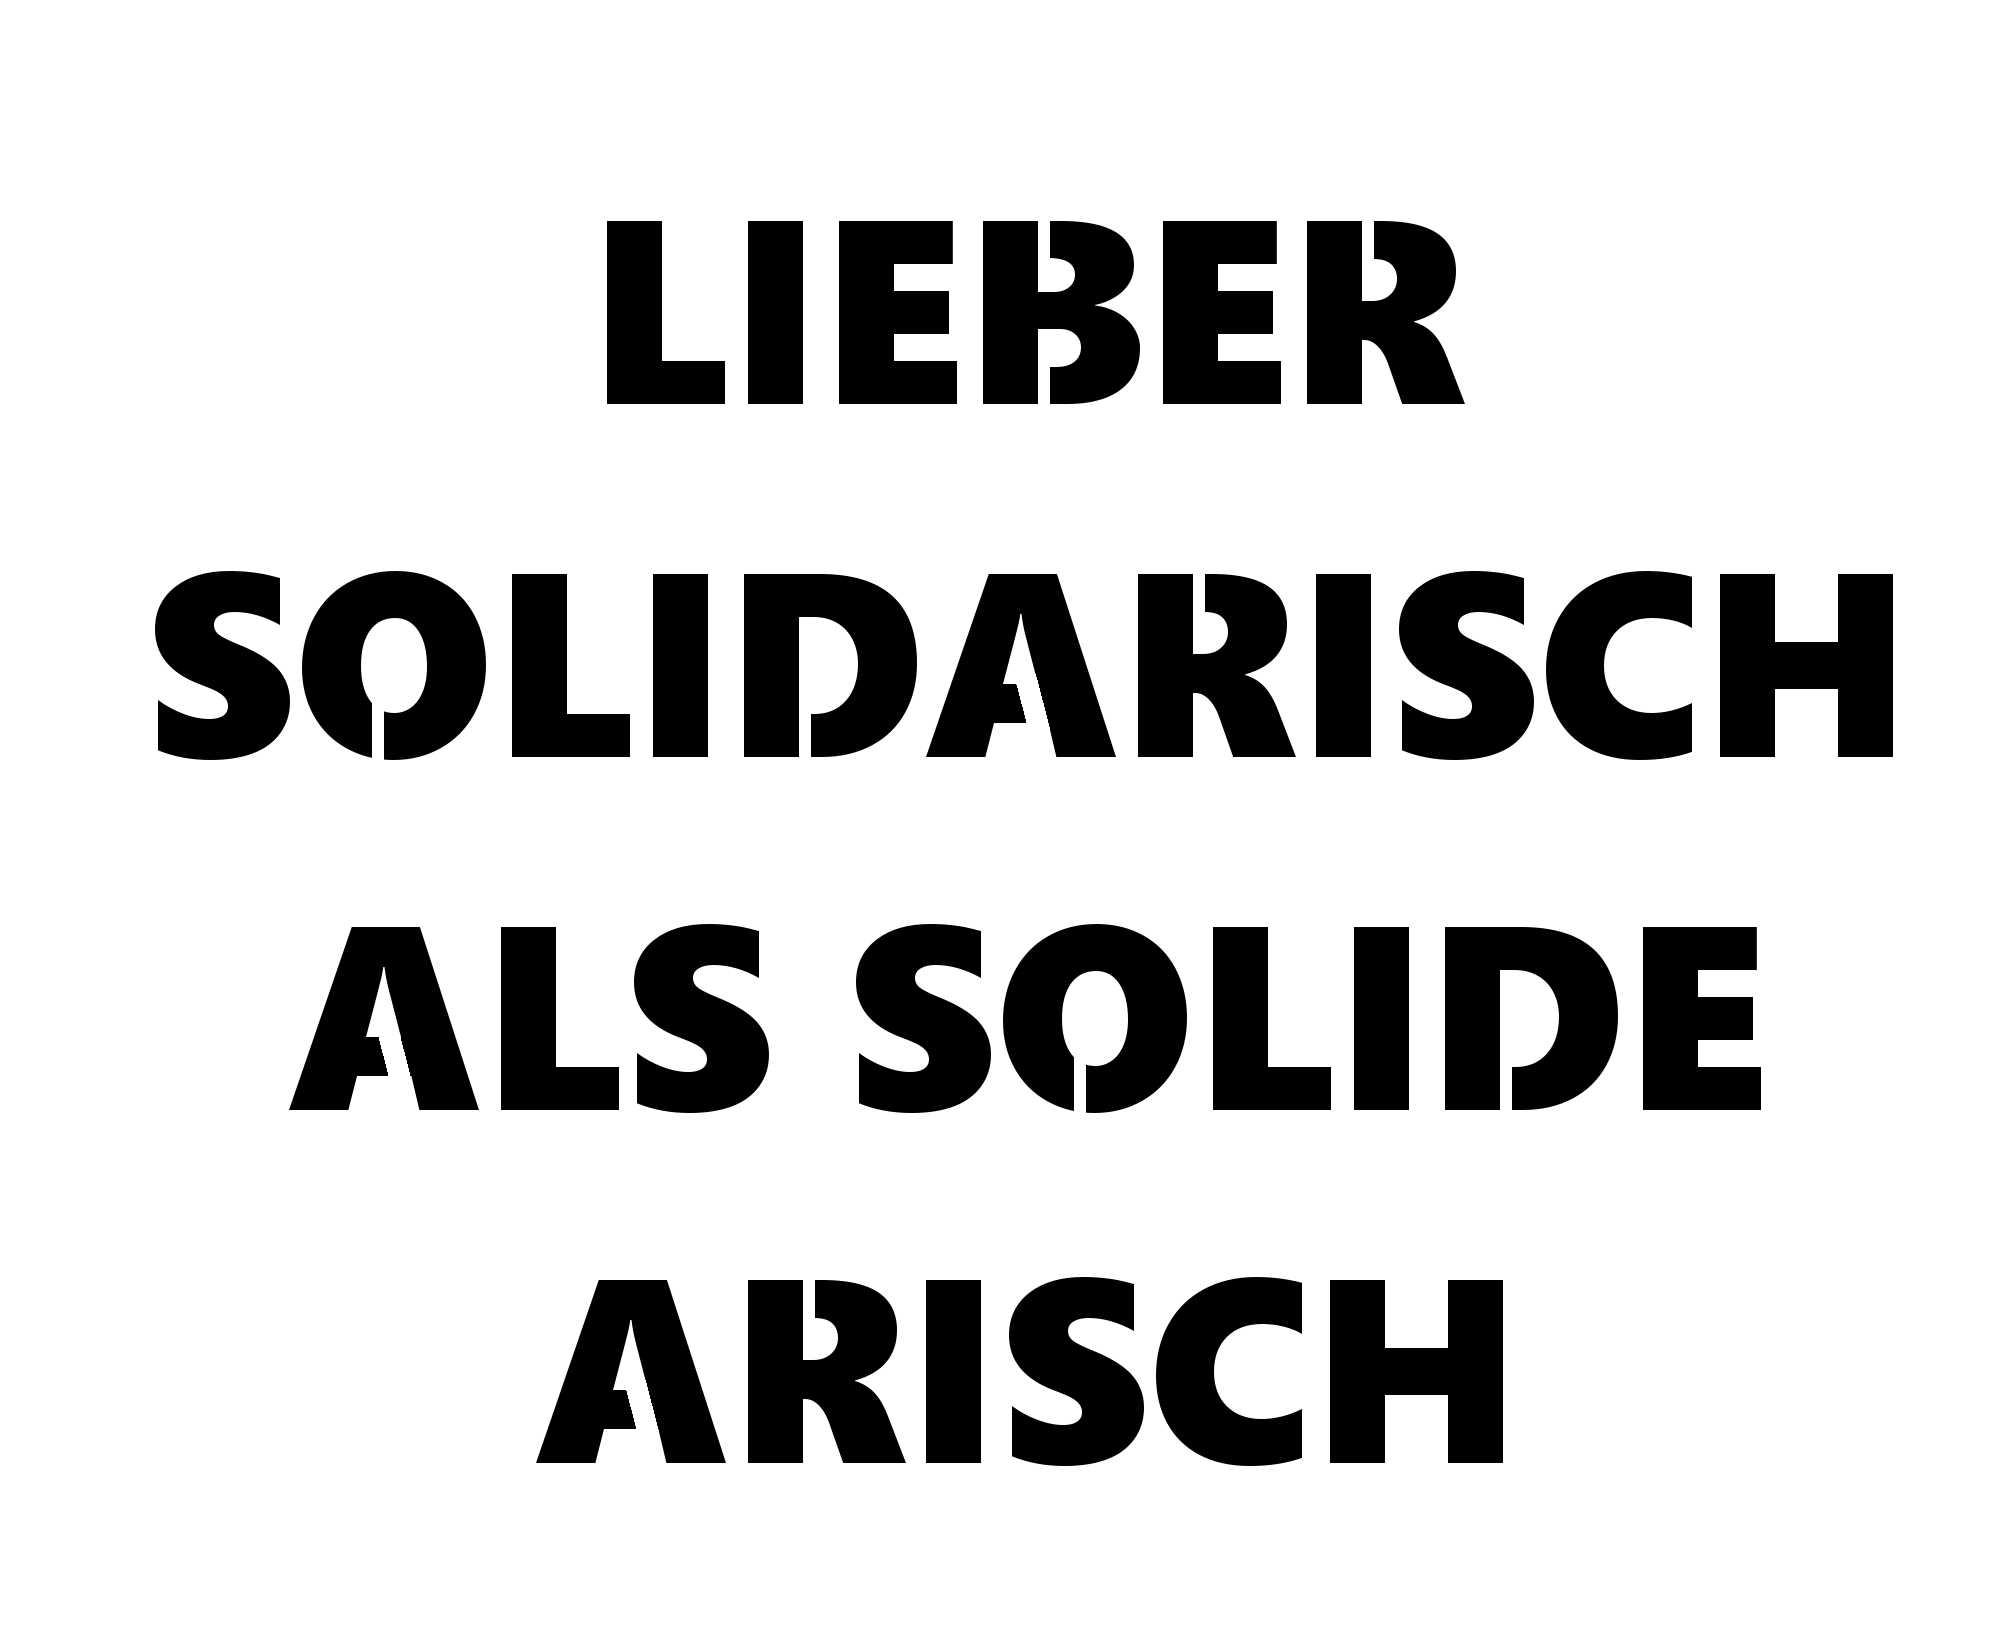 lieber solidarisch als solide arisch